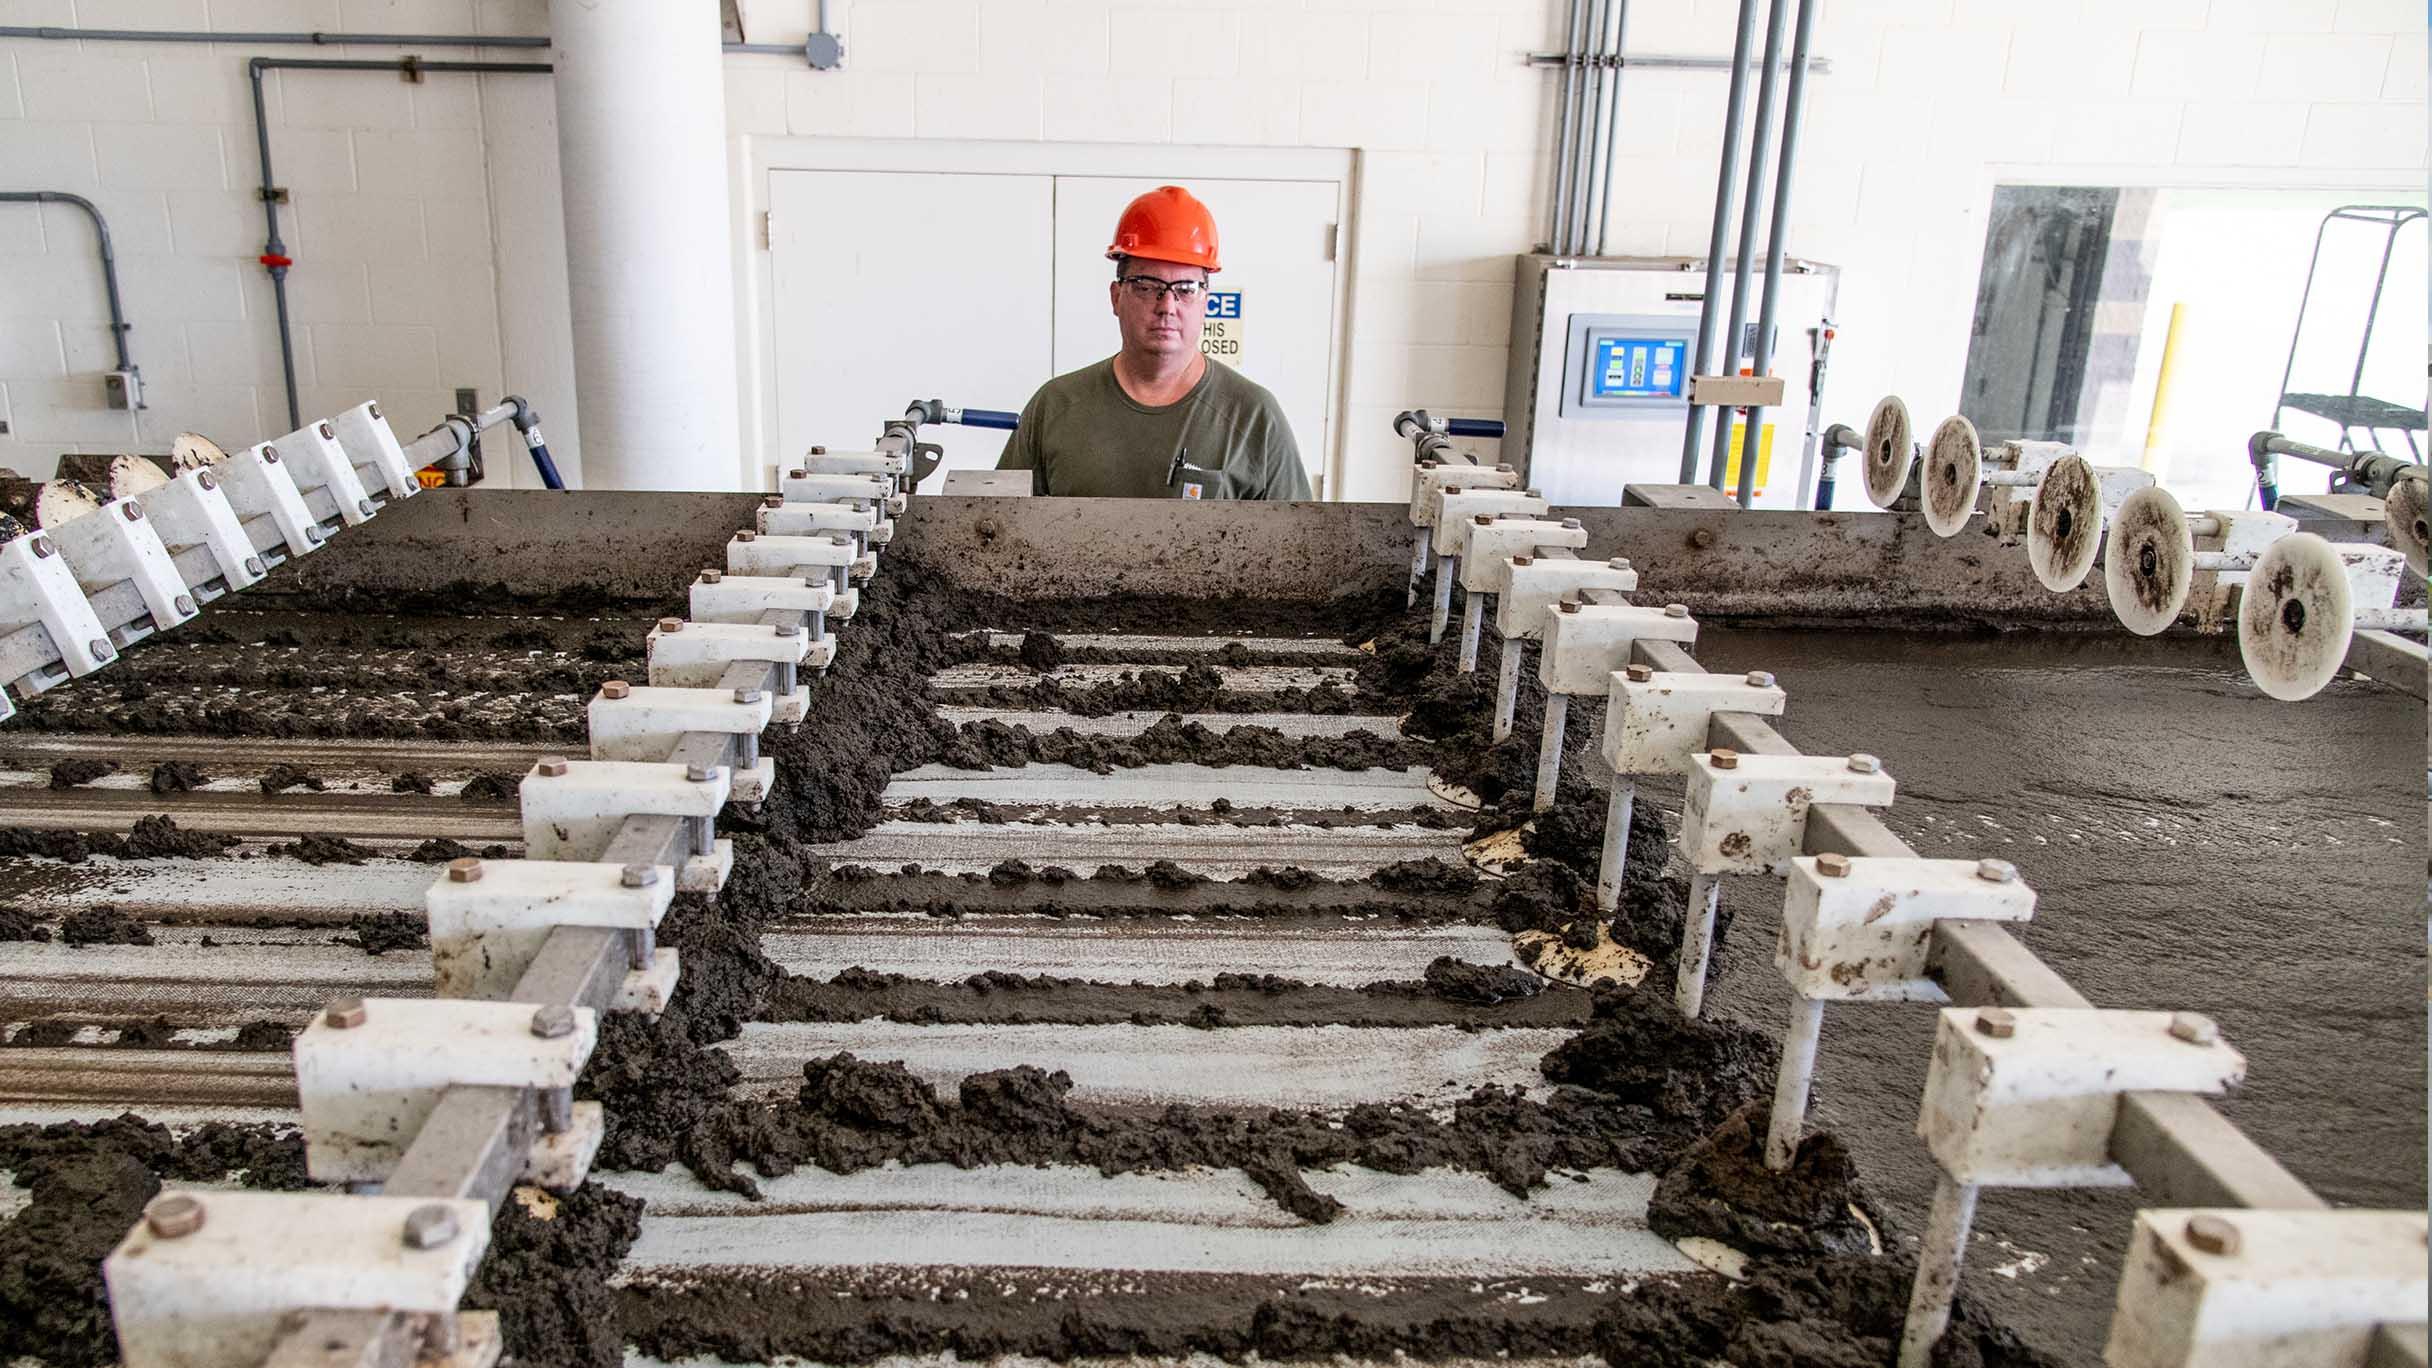 Bloomington-Normal wastewater treatment plant   GE Digital SCADA customer